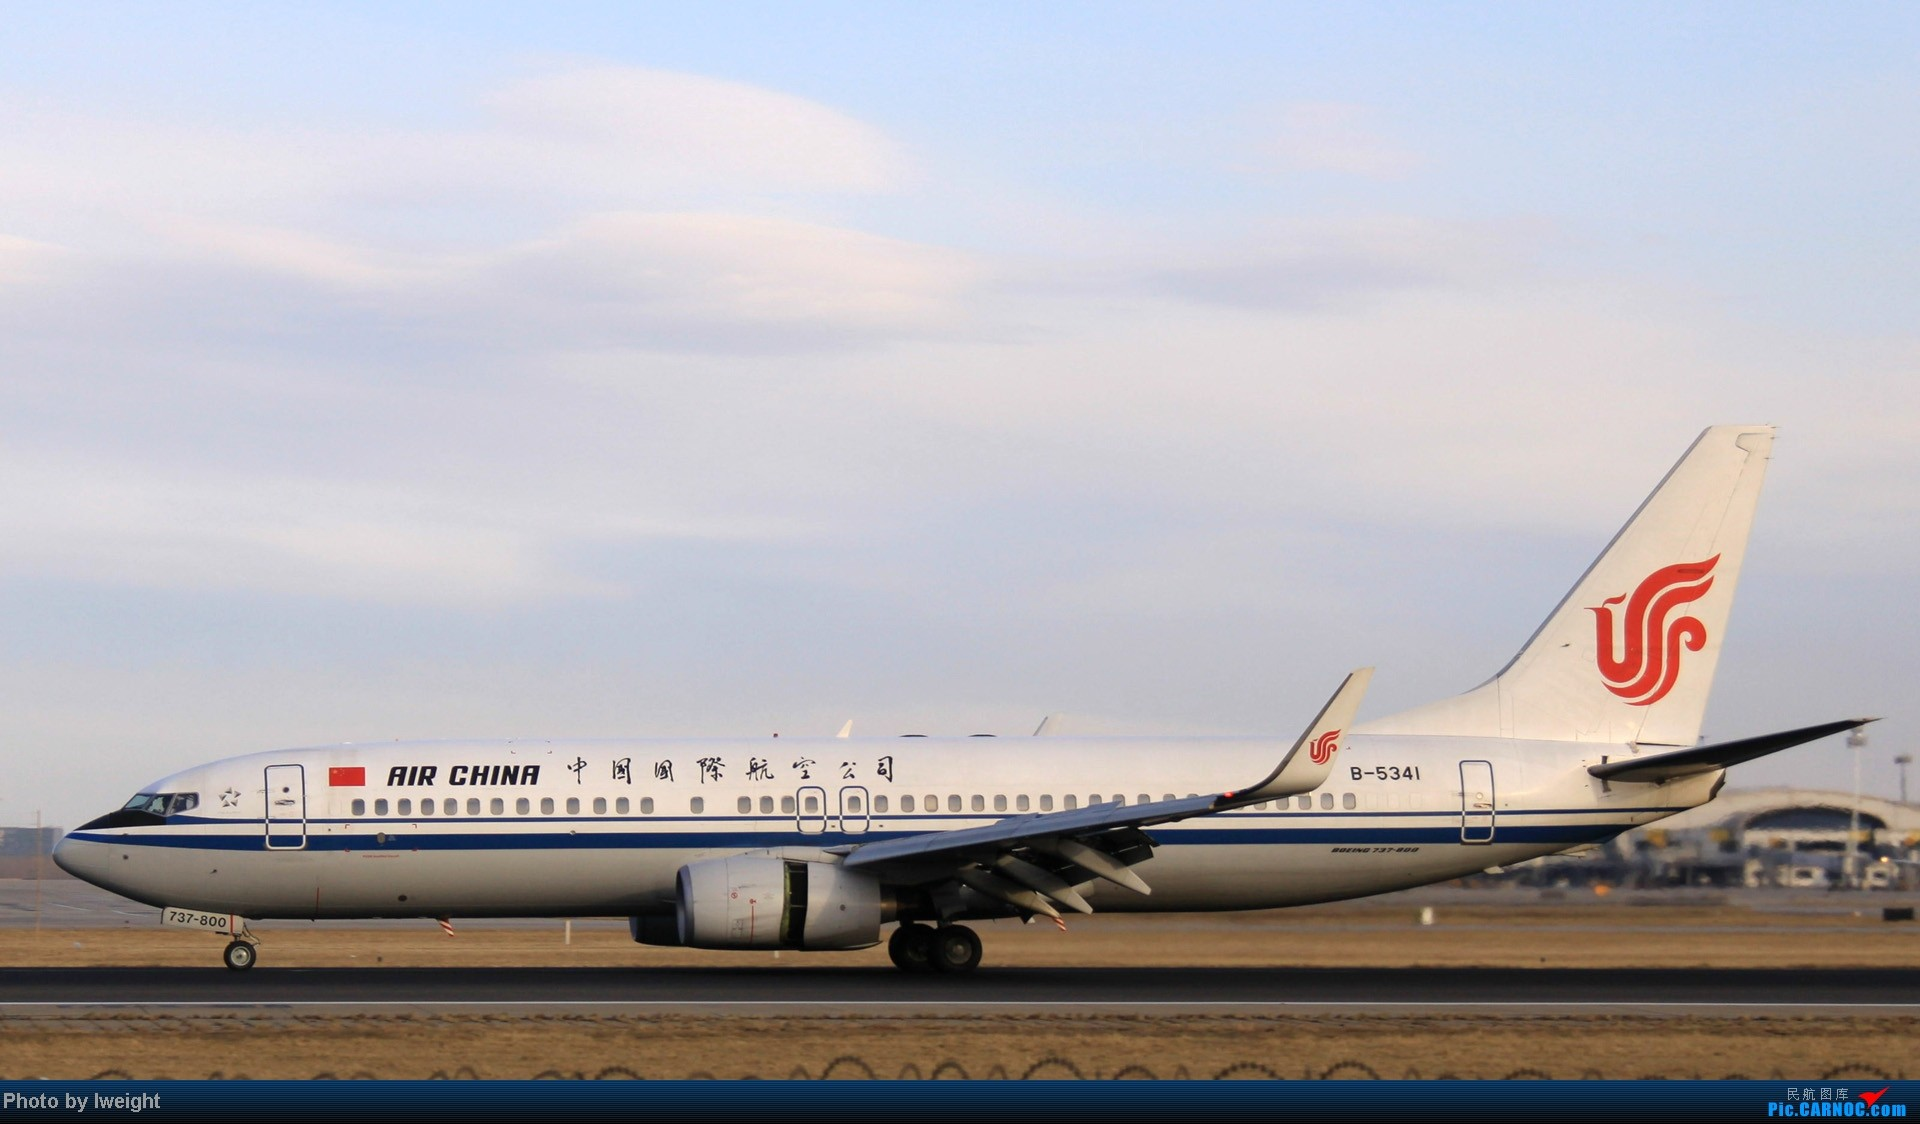 Re:[原创]今天下午瞎拍两个小时的杂图 BOEING 737-800 B-5341 中国北京首都机场